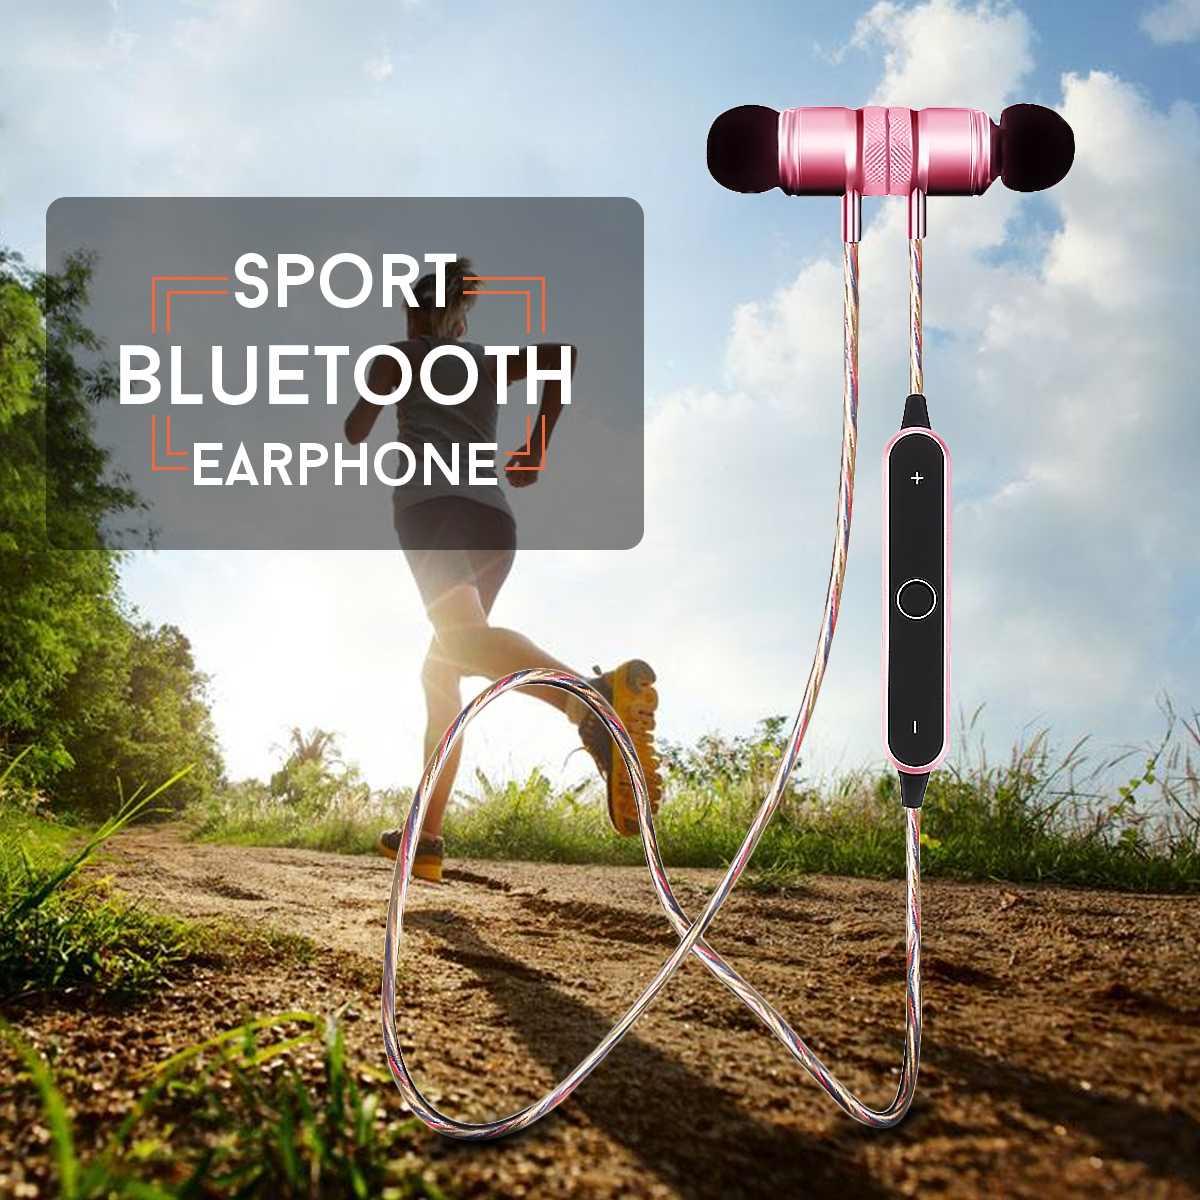 Wireless Mini Portable bluetooth 4.2 Headphone Cvc6.0 Stereo In-ear Earbuds Headset bluetooth Earphone Headphones Headset